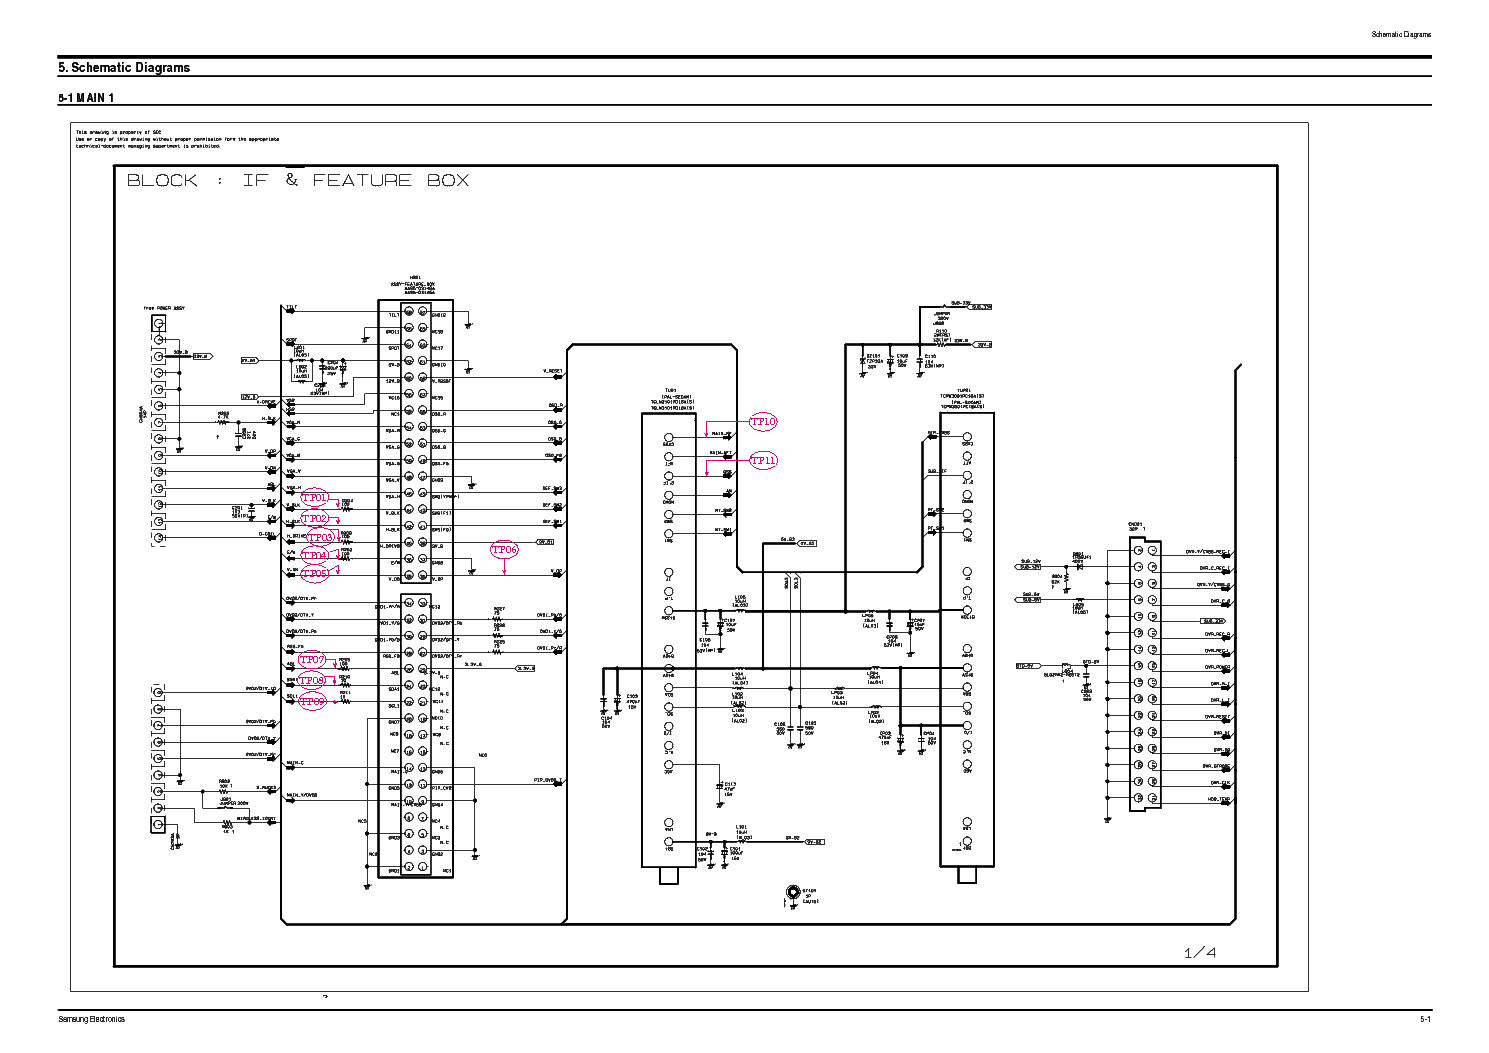 Samsung Un32c5000qf Un37c5000qf Un40c5000qf Un46c5000qf Un32c5000qr Crt Wiring Diagram Ws32z108rt